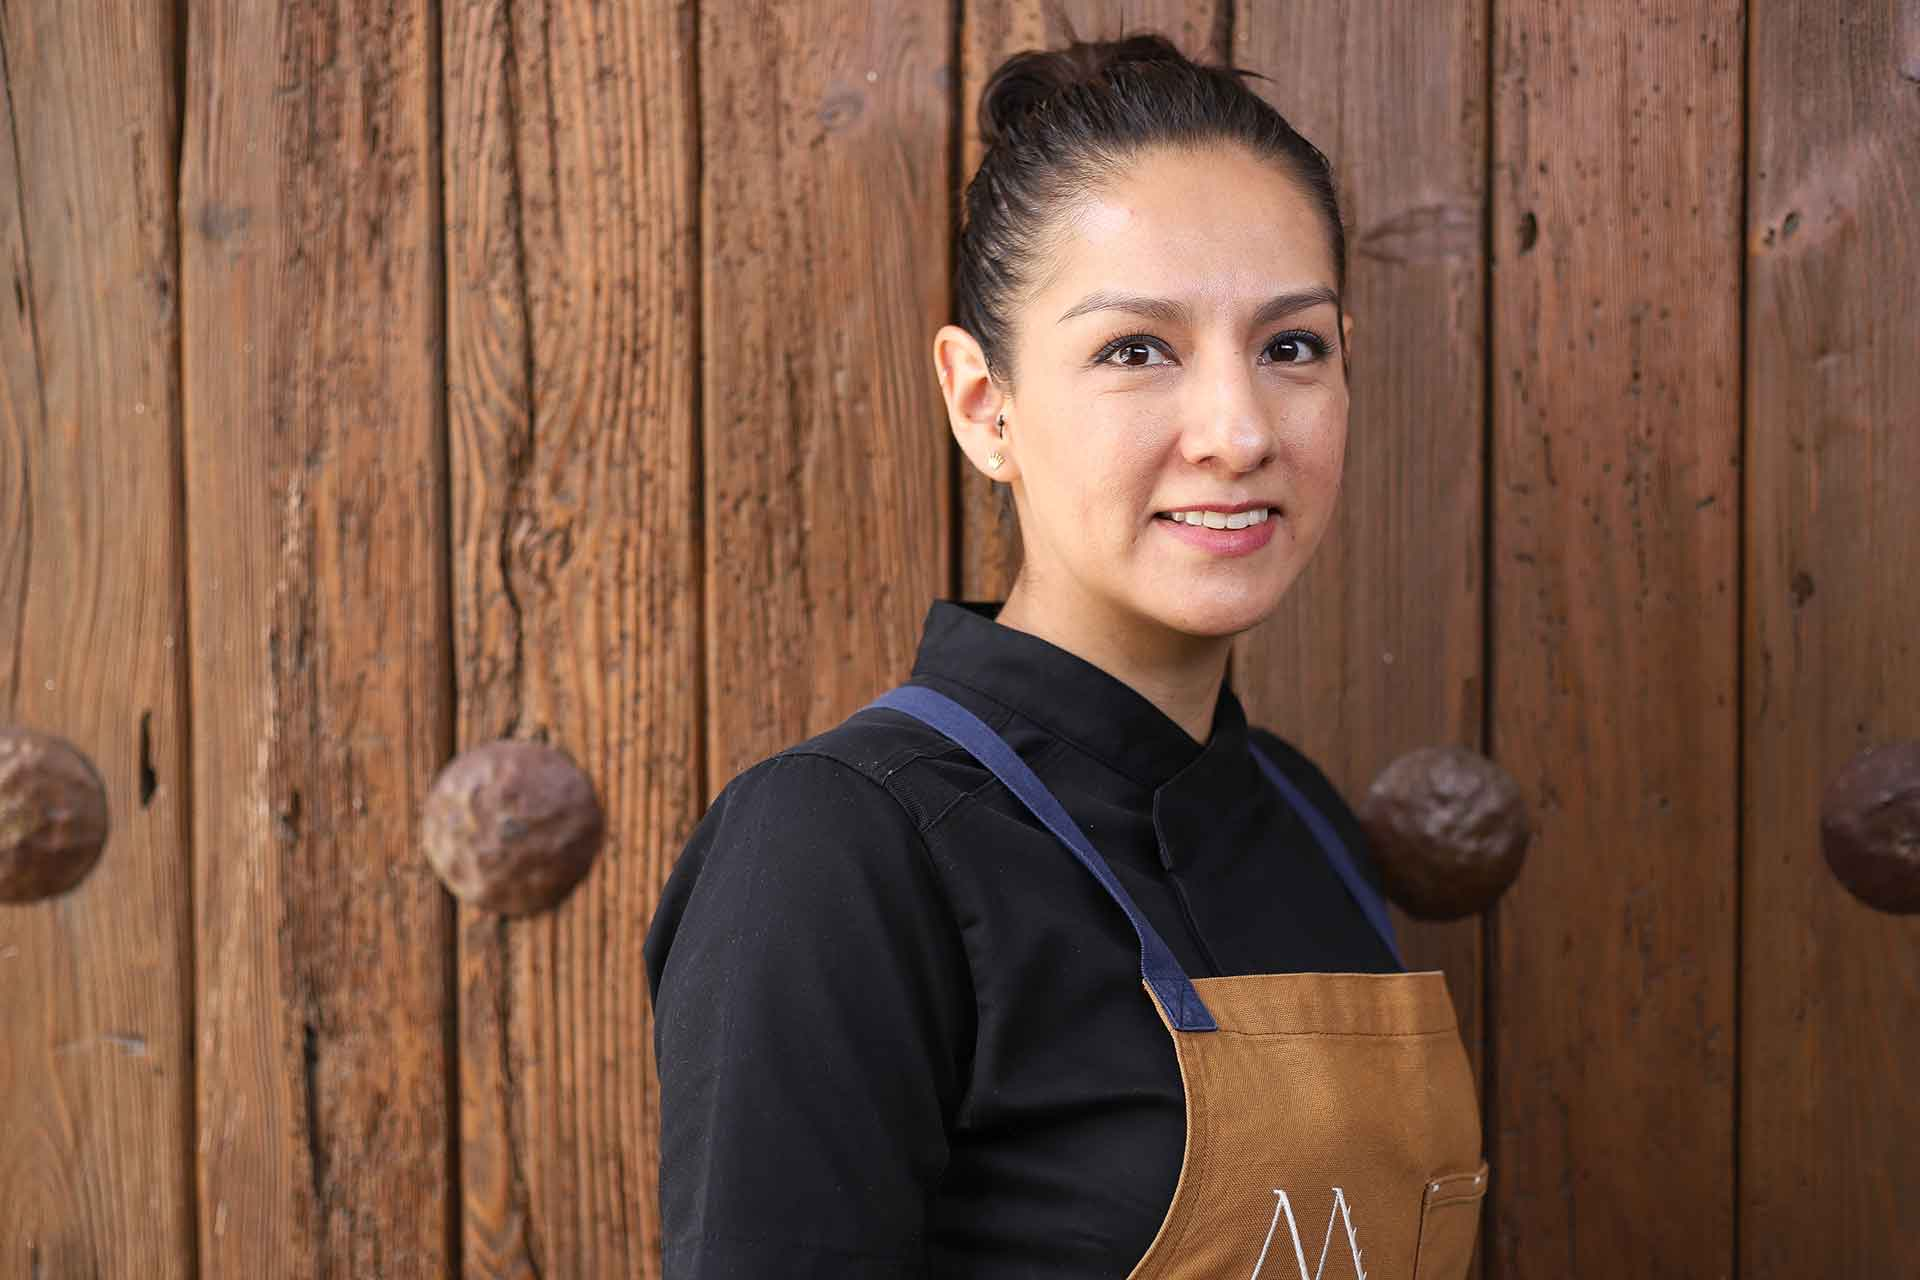 Chef Liz Galicia